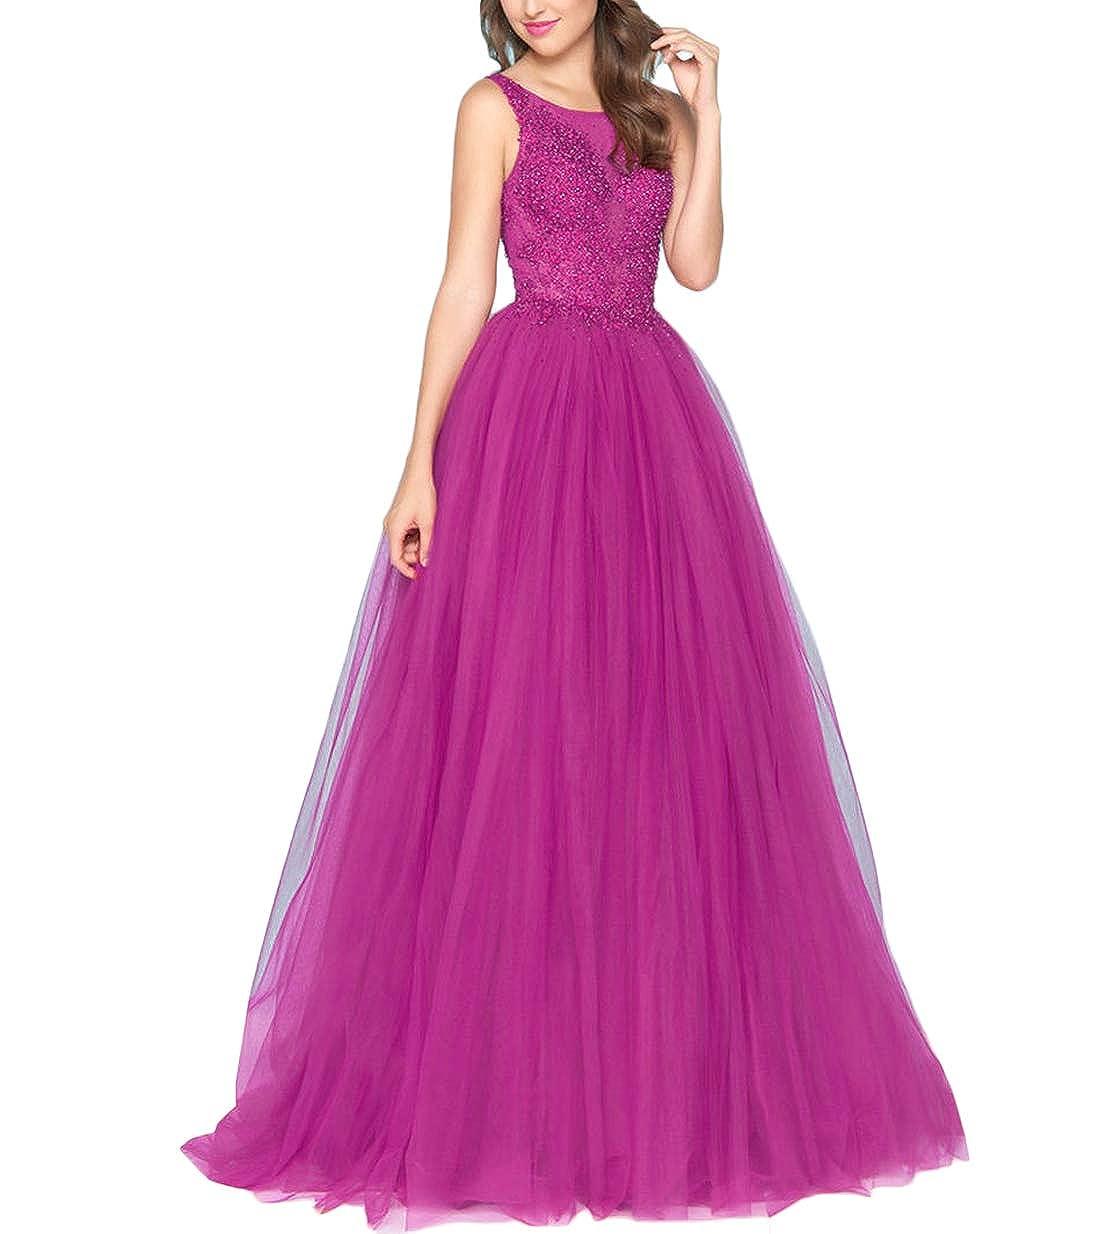 Fuchsia Yisha Bello Women's ALine Pearls Beaded Pro Dress Long Tulle Quinceanera Dress Evening Ball Gowns